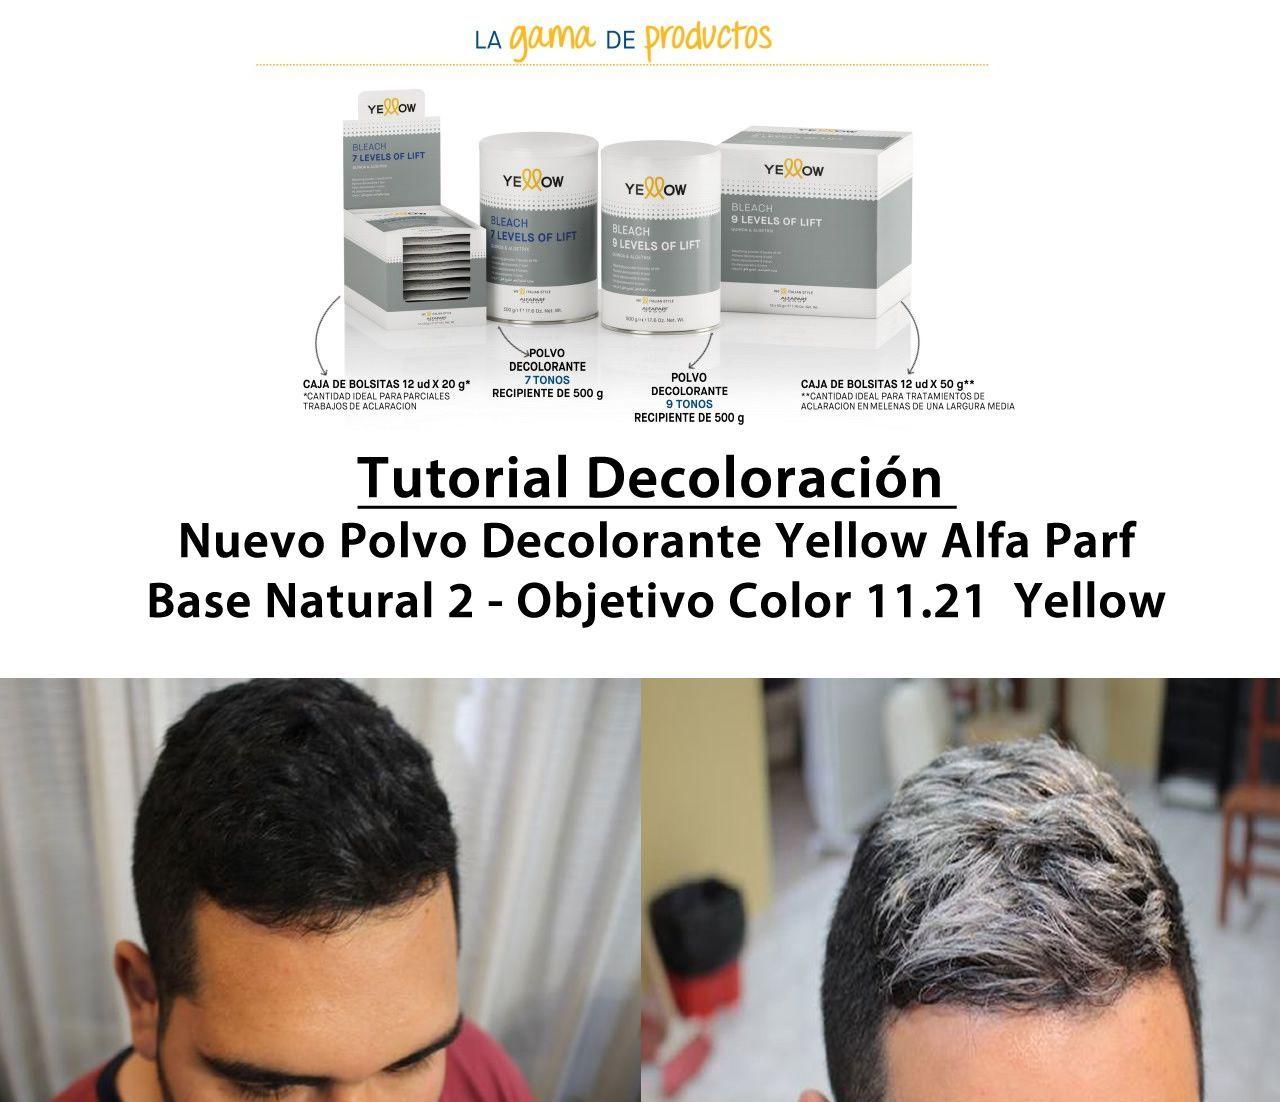 decoloracion yellow alfa parf 11.21